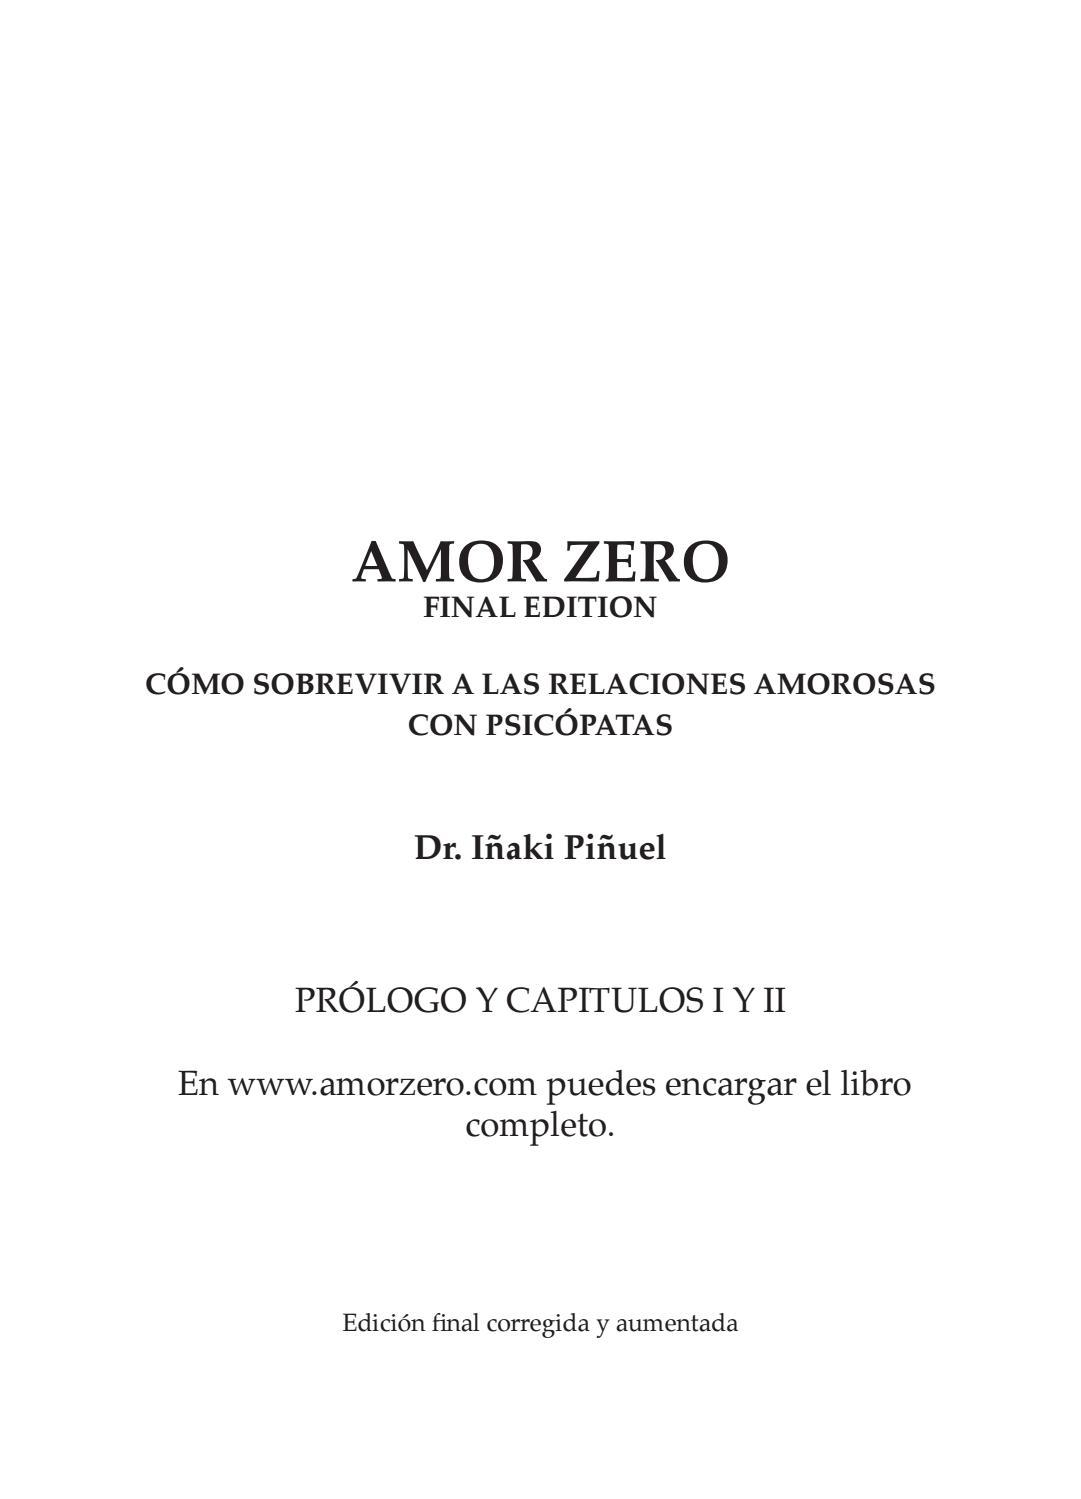 Amor Zero (Resumen) by AmorZero - issuu